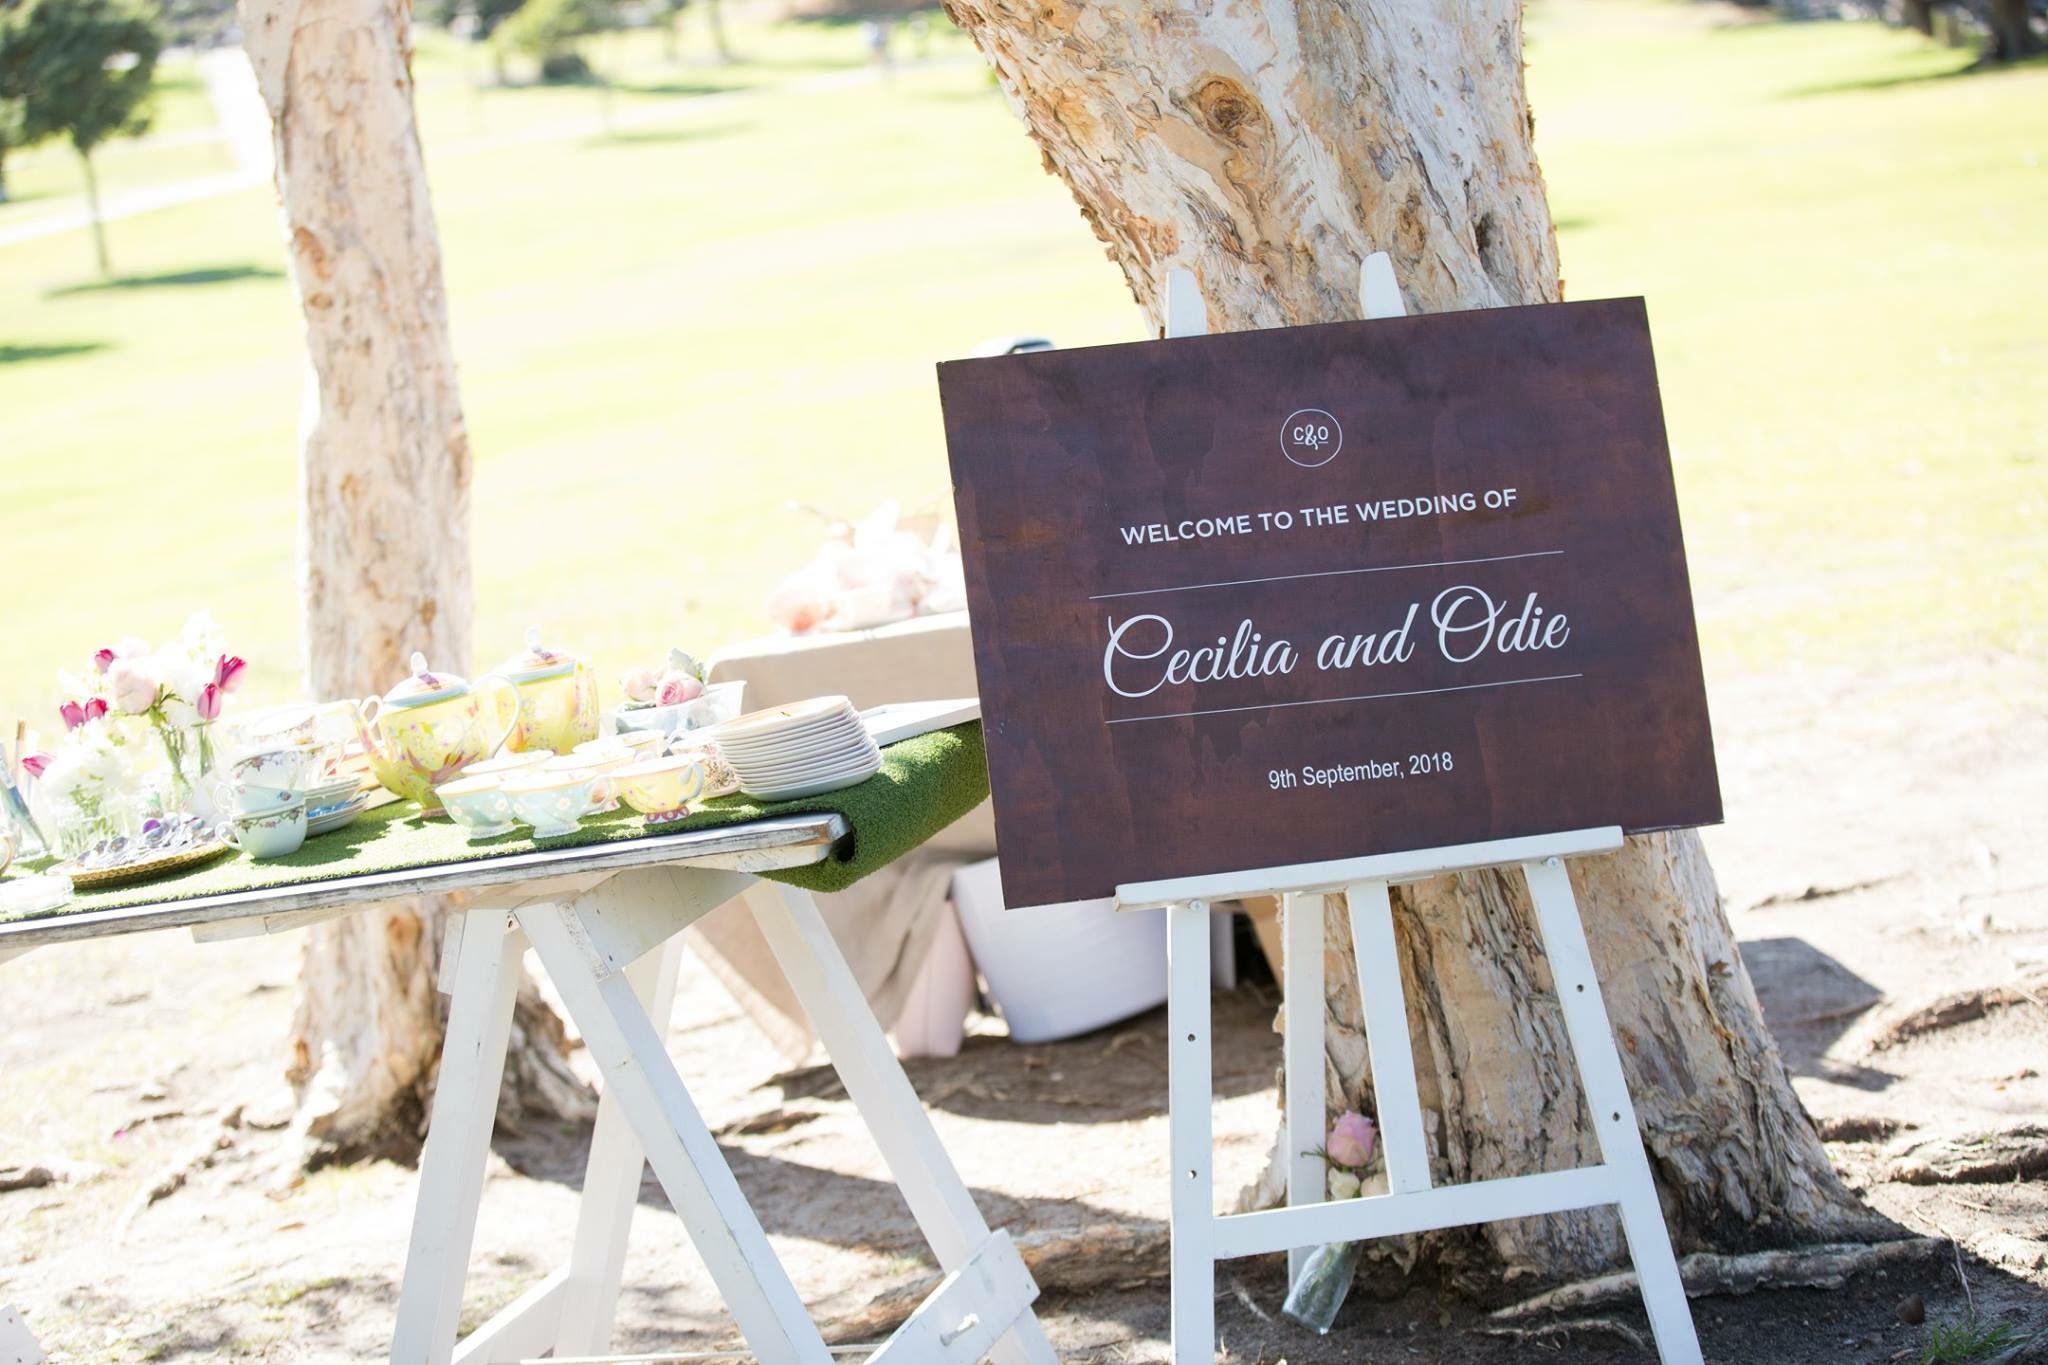 Wedding sign and wedding ceremony set up - Sydney wedding planner Samantha Burke Events